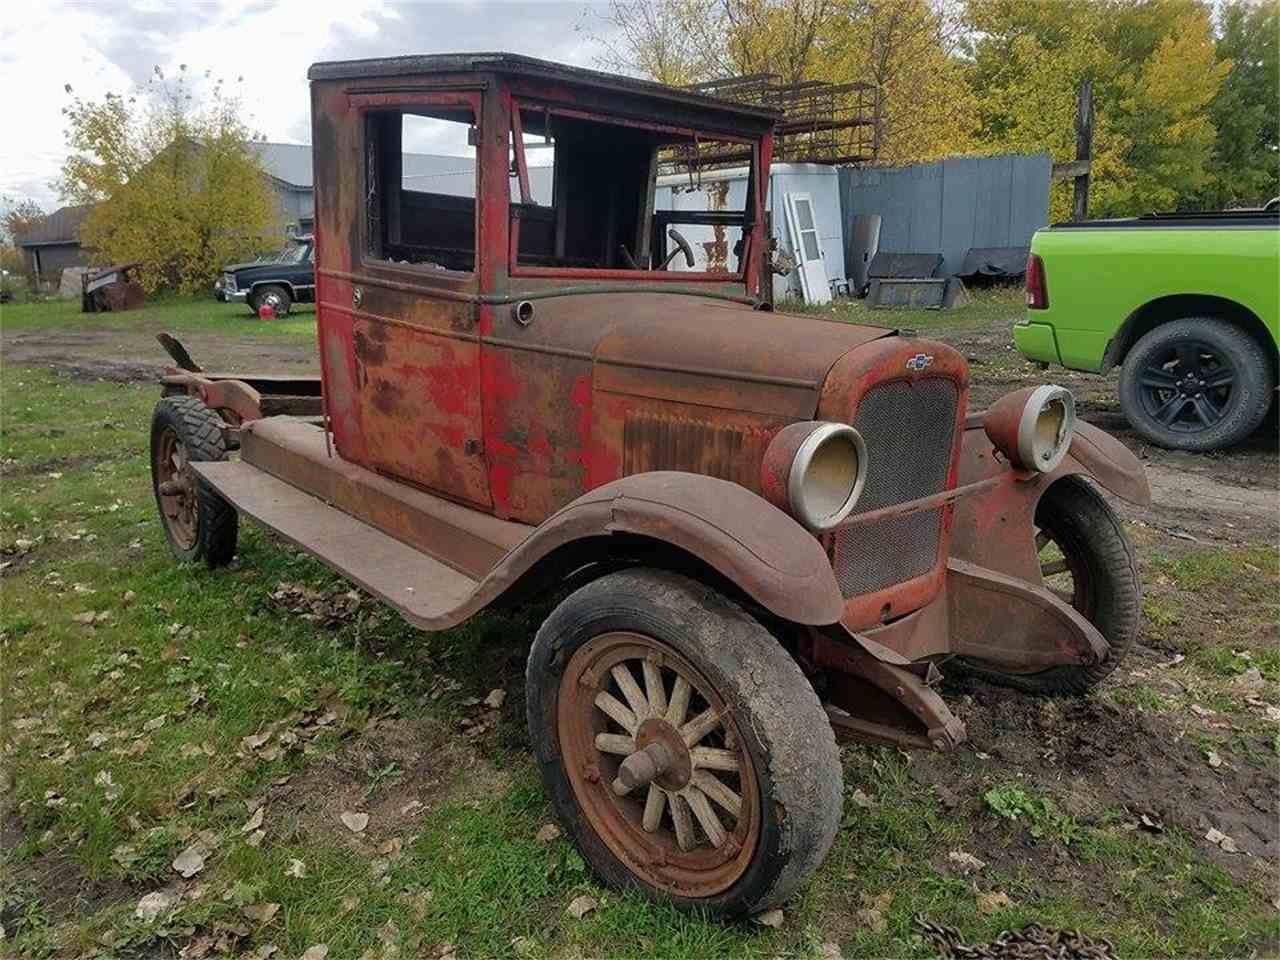 1925 Chevrolet 1 Ton Pickup for Sale   ClassicCars.com   CC-1029350